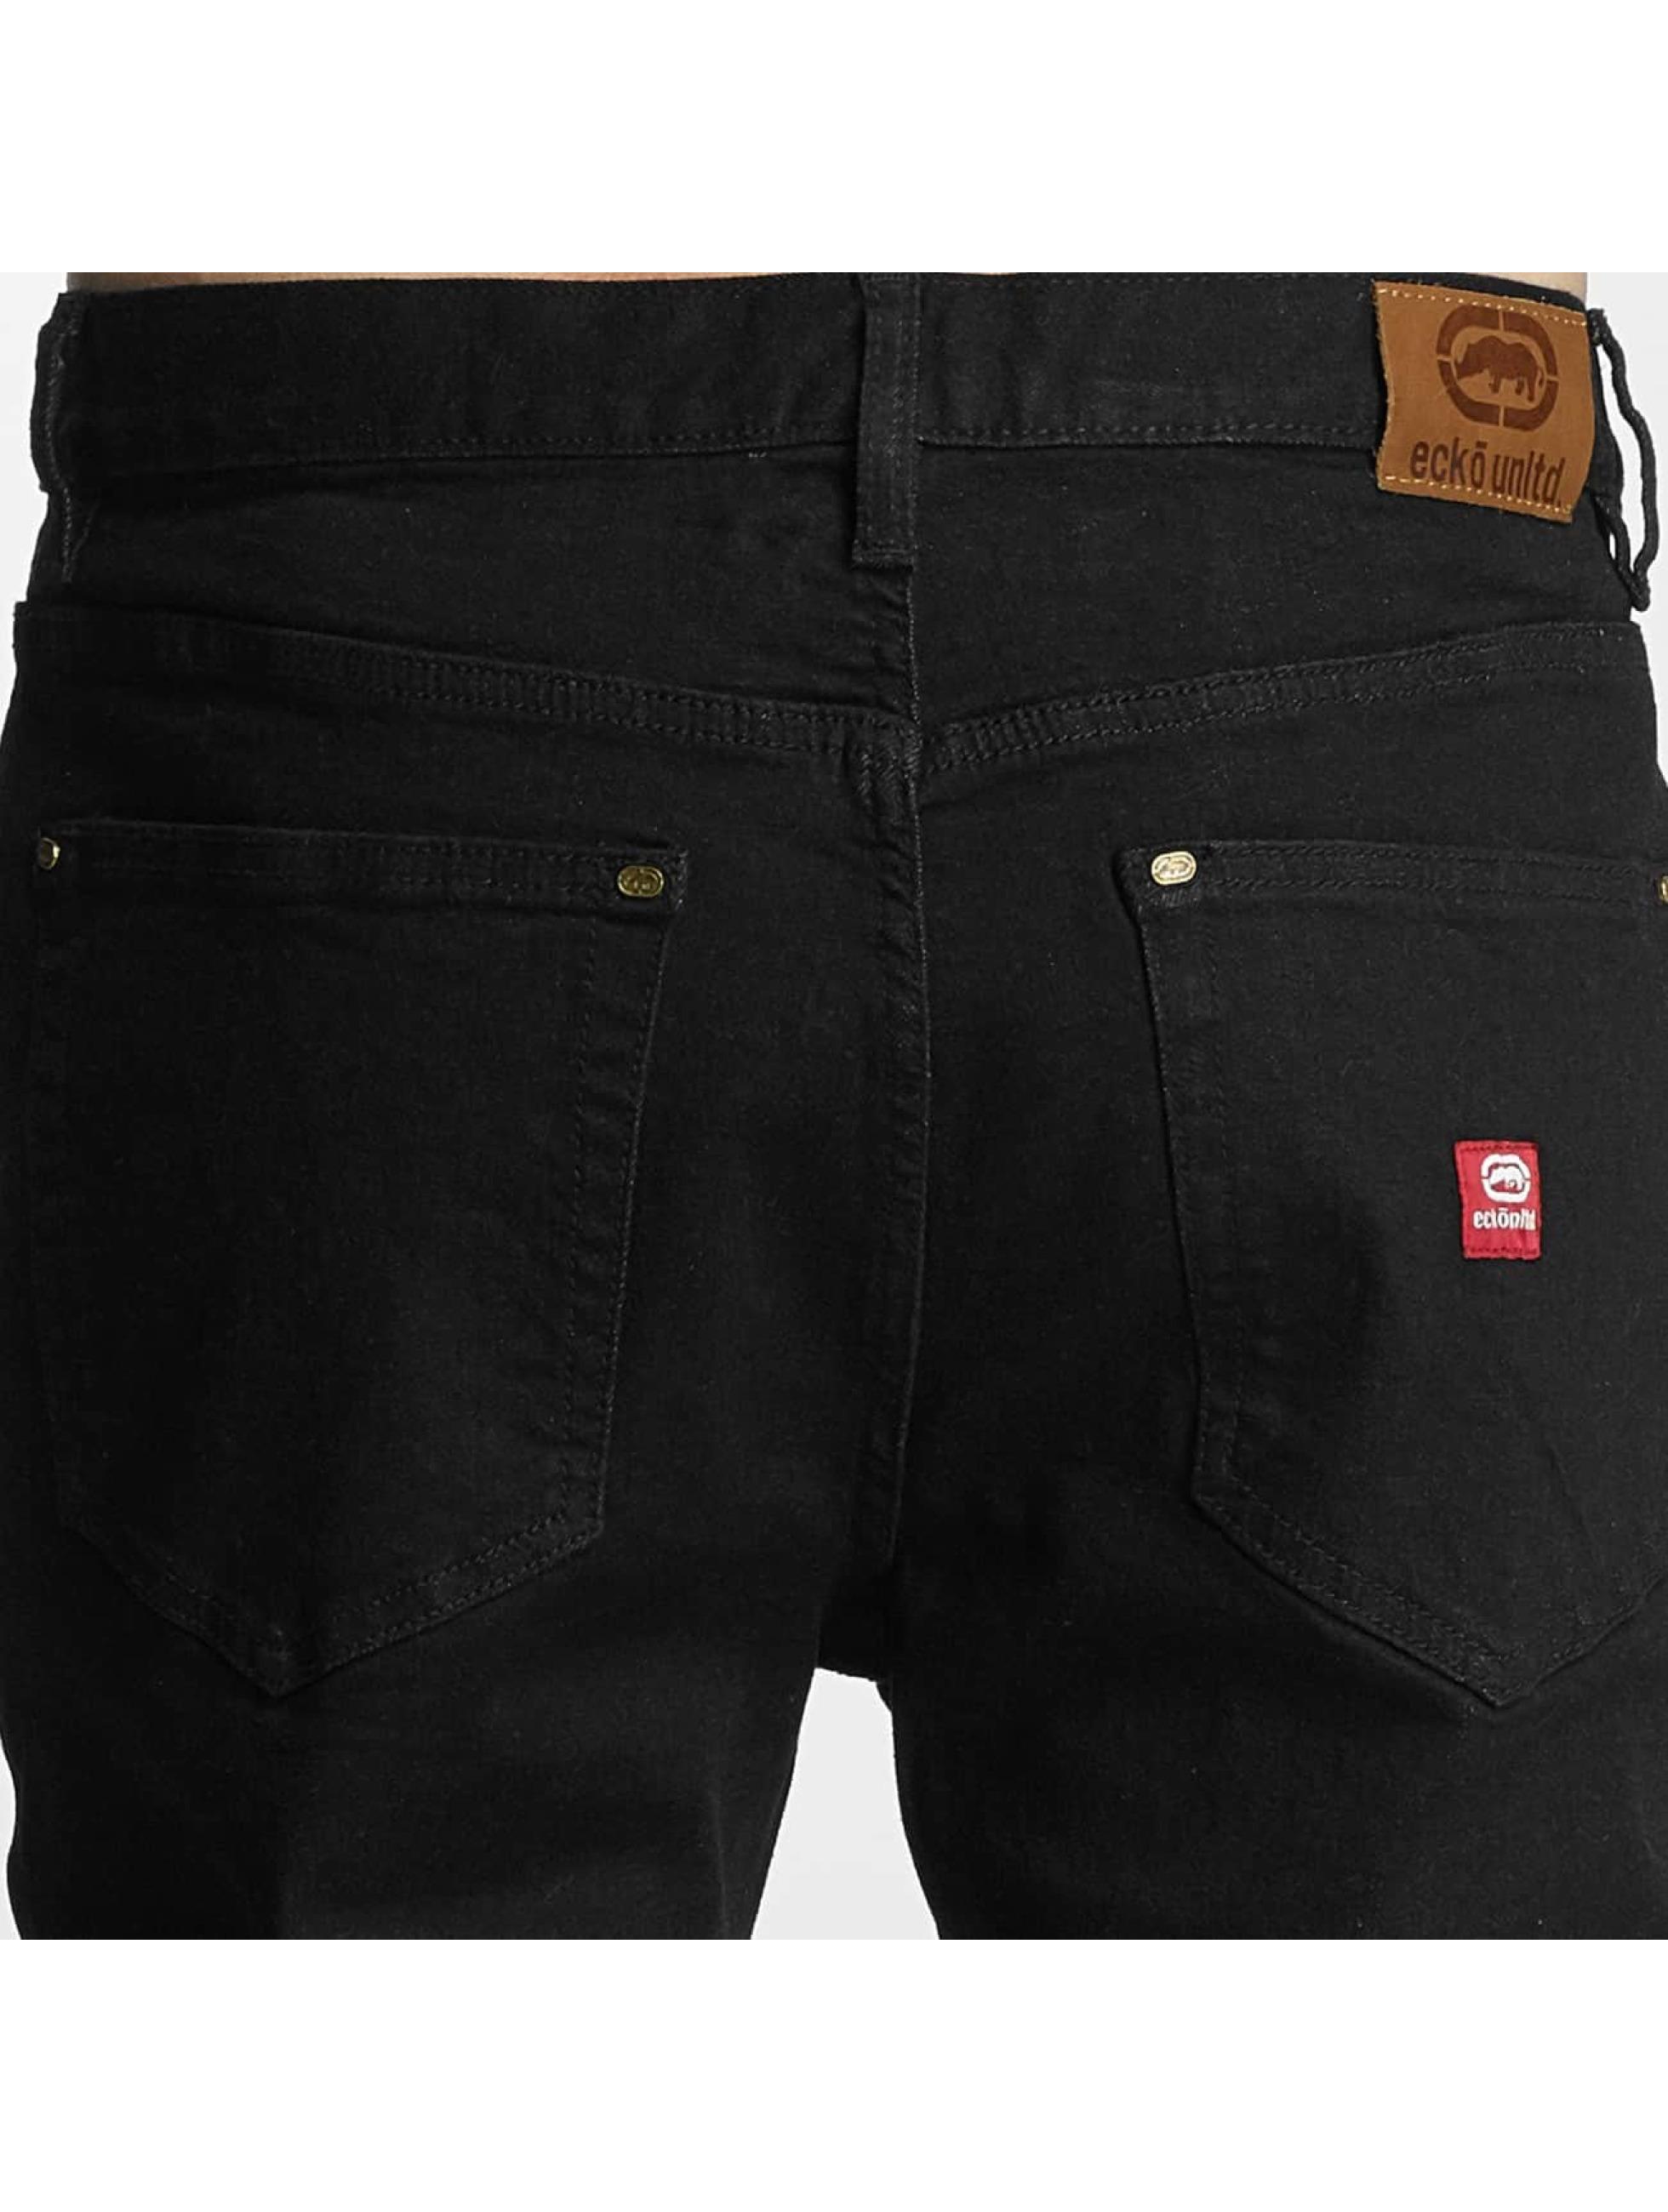 Ecko Unltd. Slim Fit Jeans Coruscant black